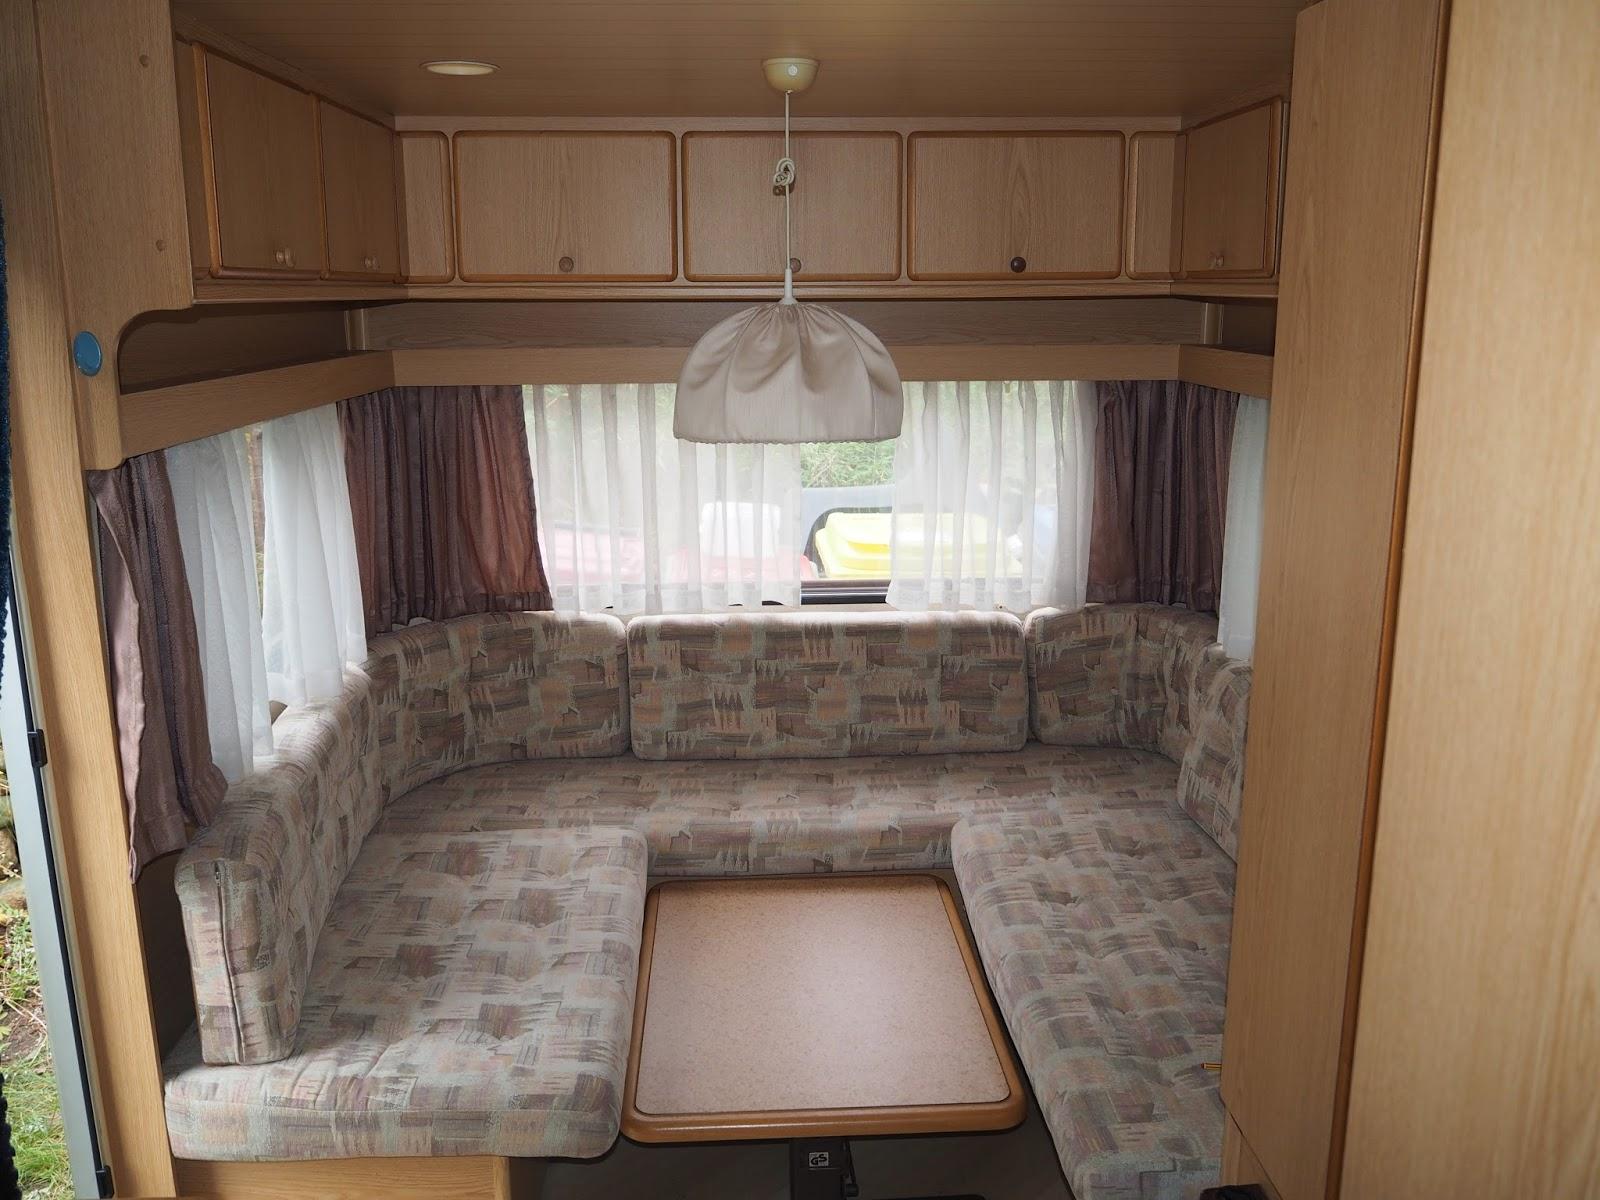 ullidade projekt wohnwagen renovieren. Black Bedroom Furniture Sets. Home Design Ideas